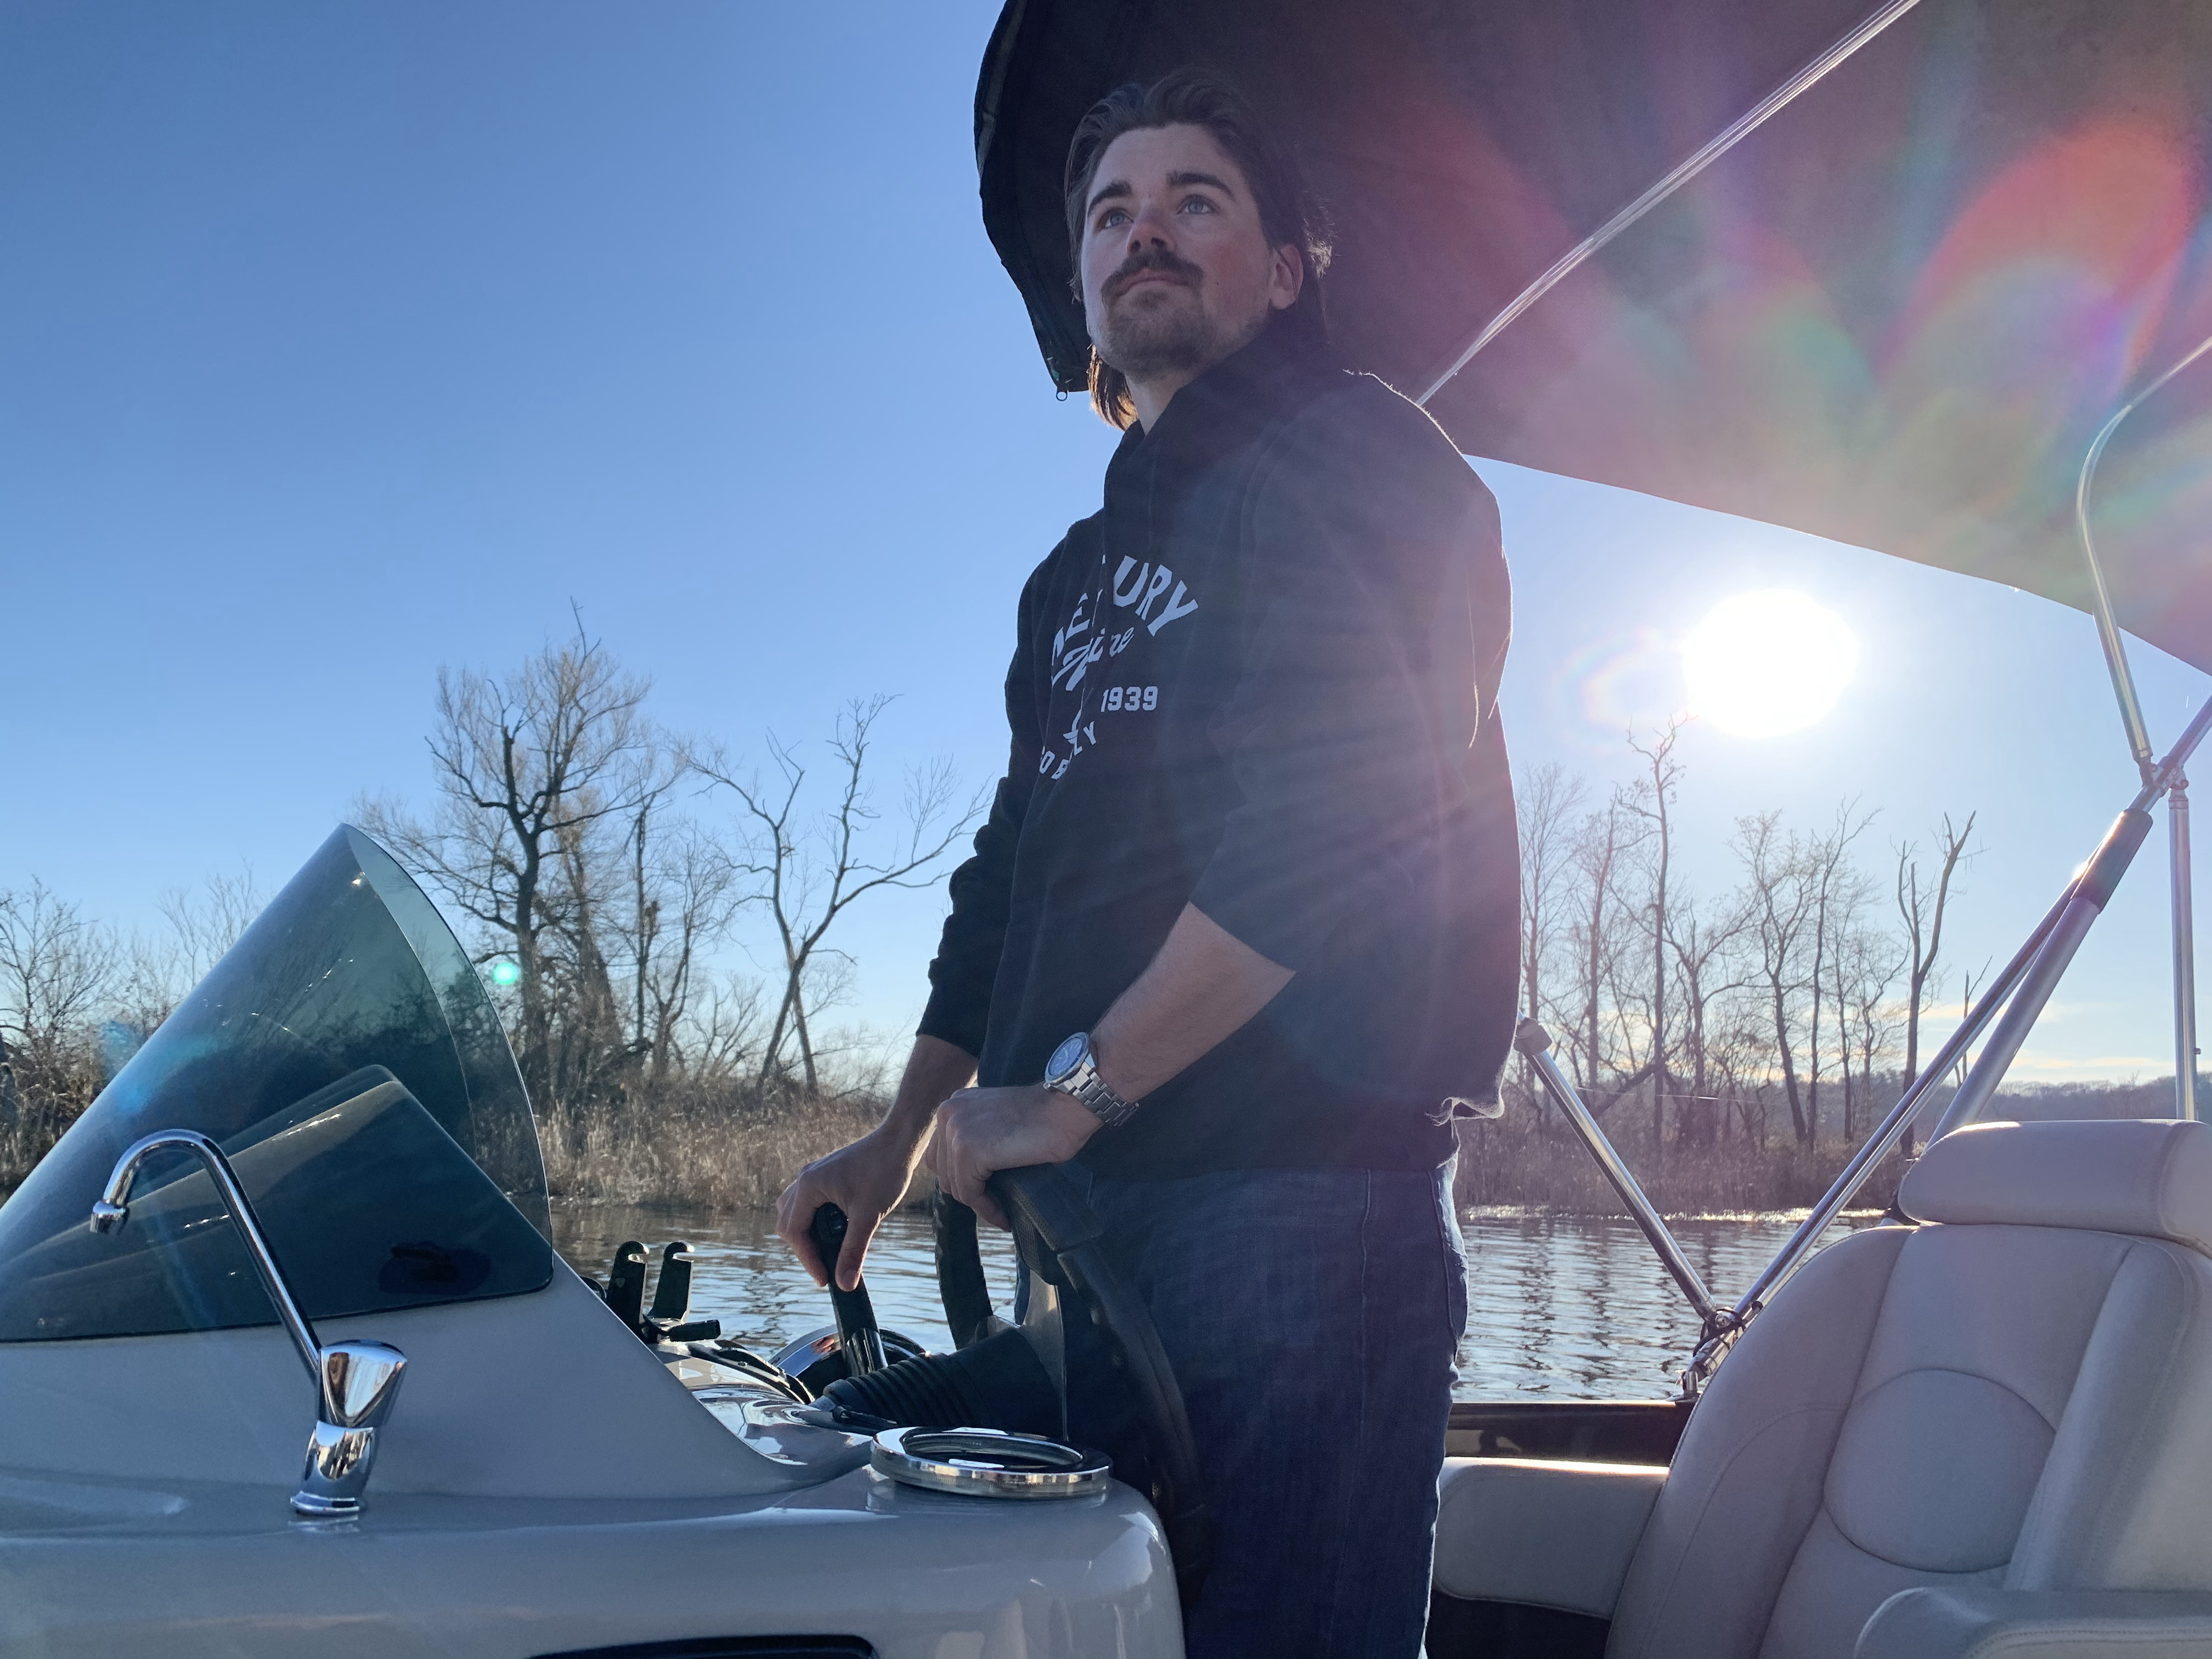 1 Hour Boating Instruction